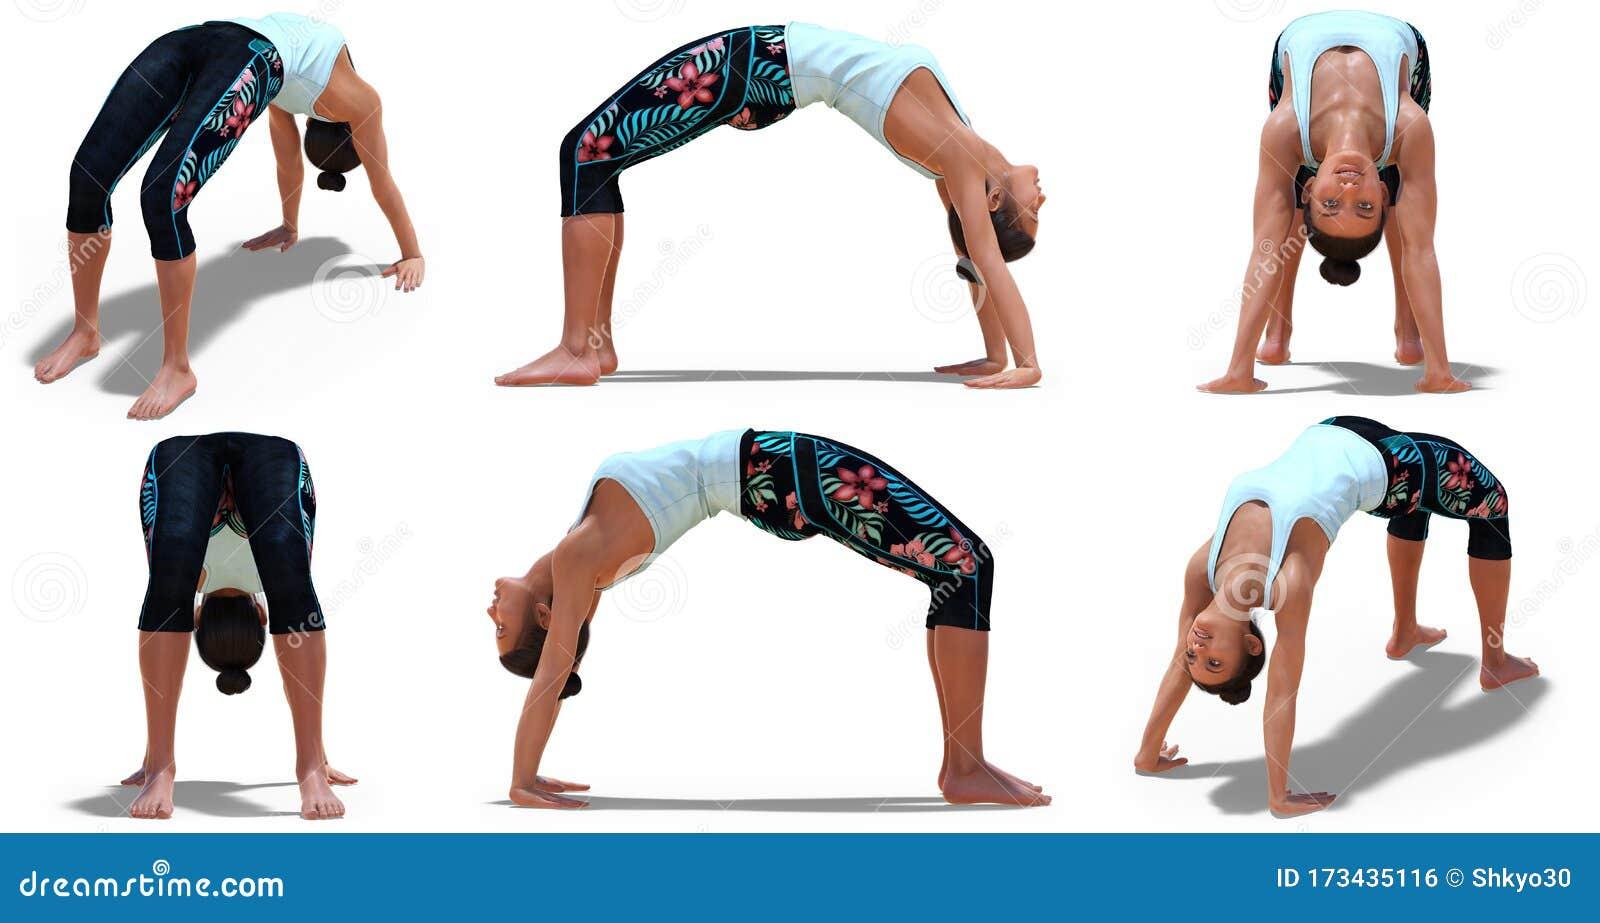 Yoga Wheel Pose Stock Illustrations – 50 Yoga Wheel Pose Stock ...